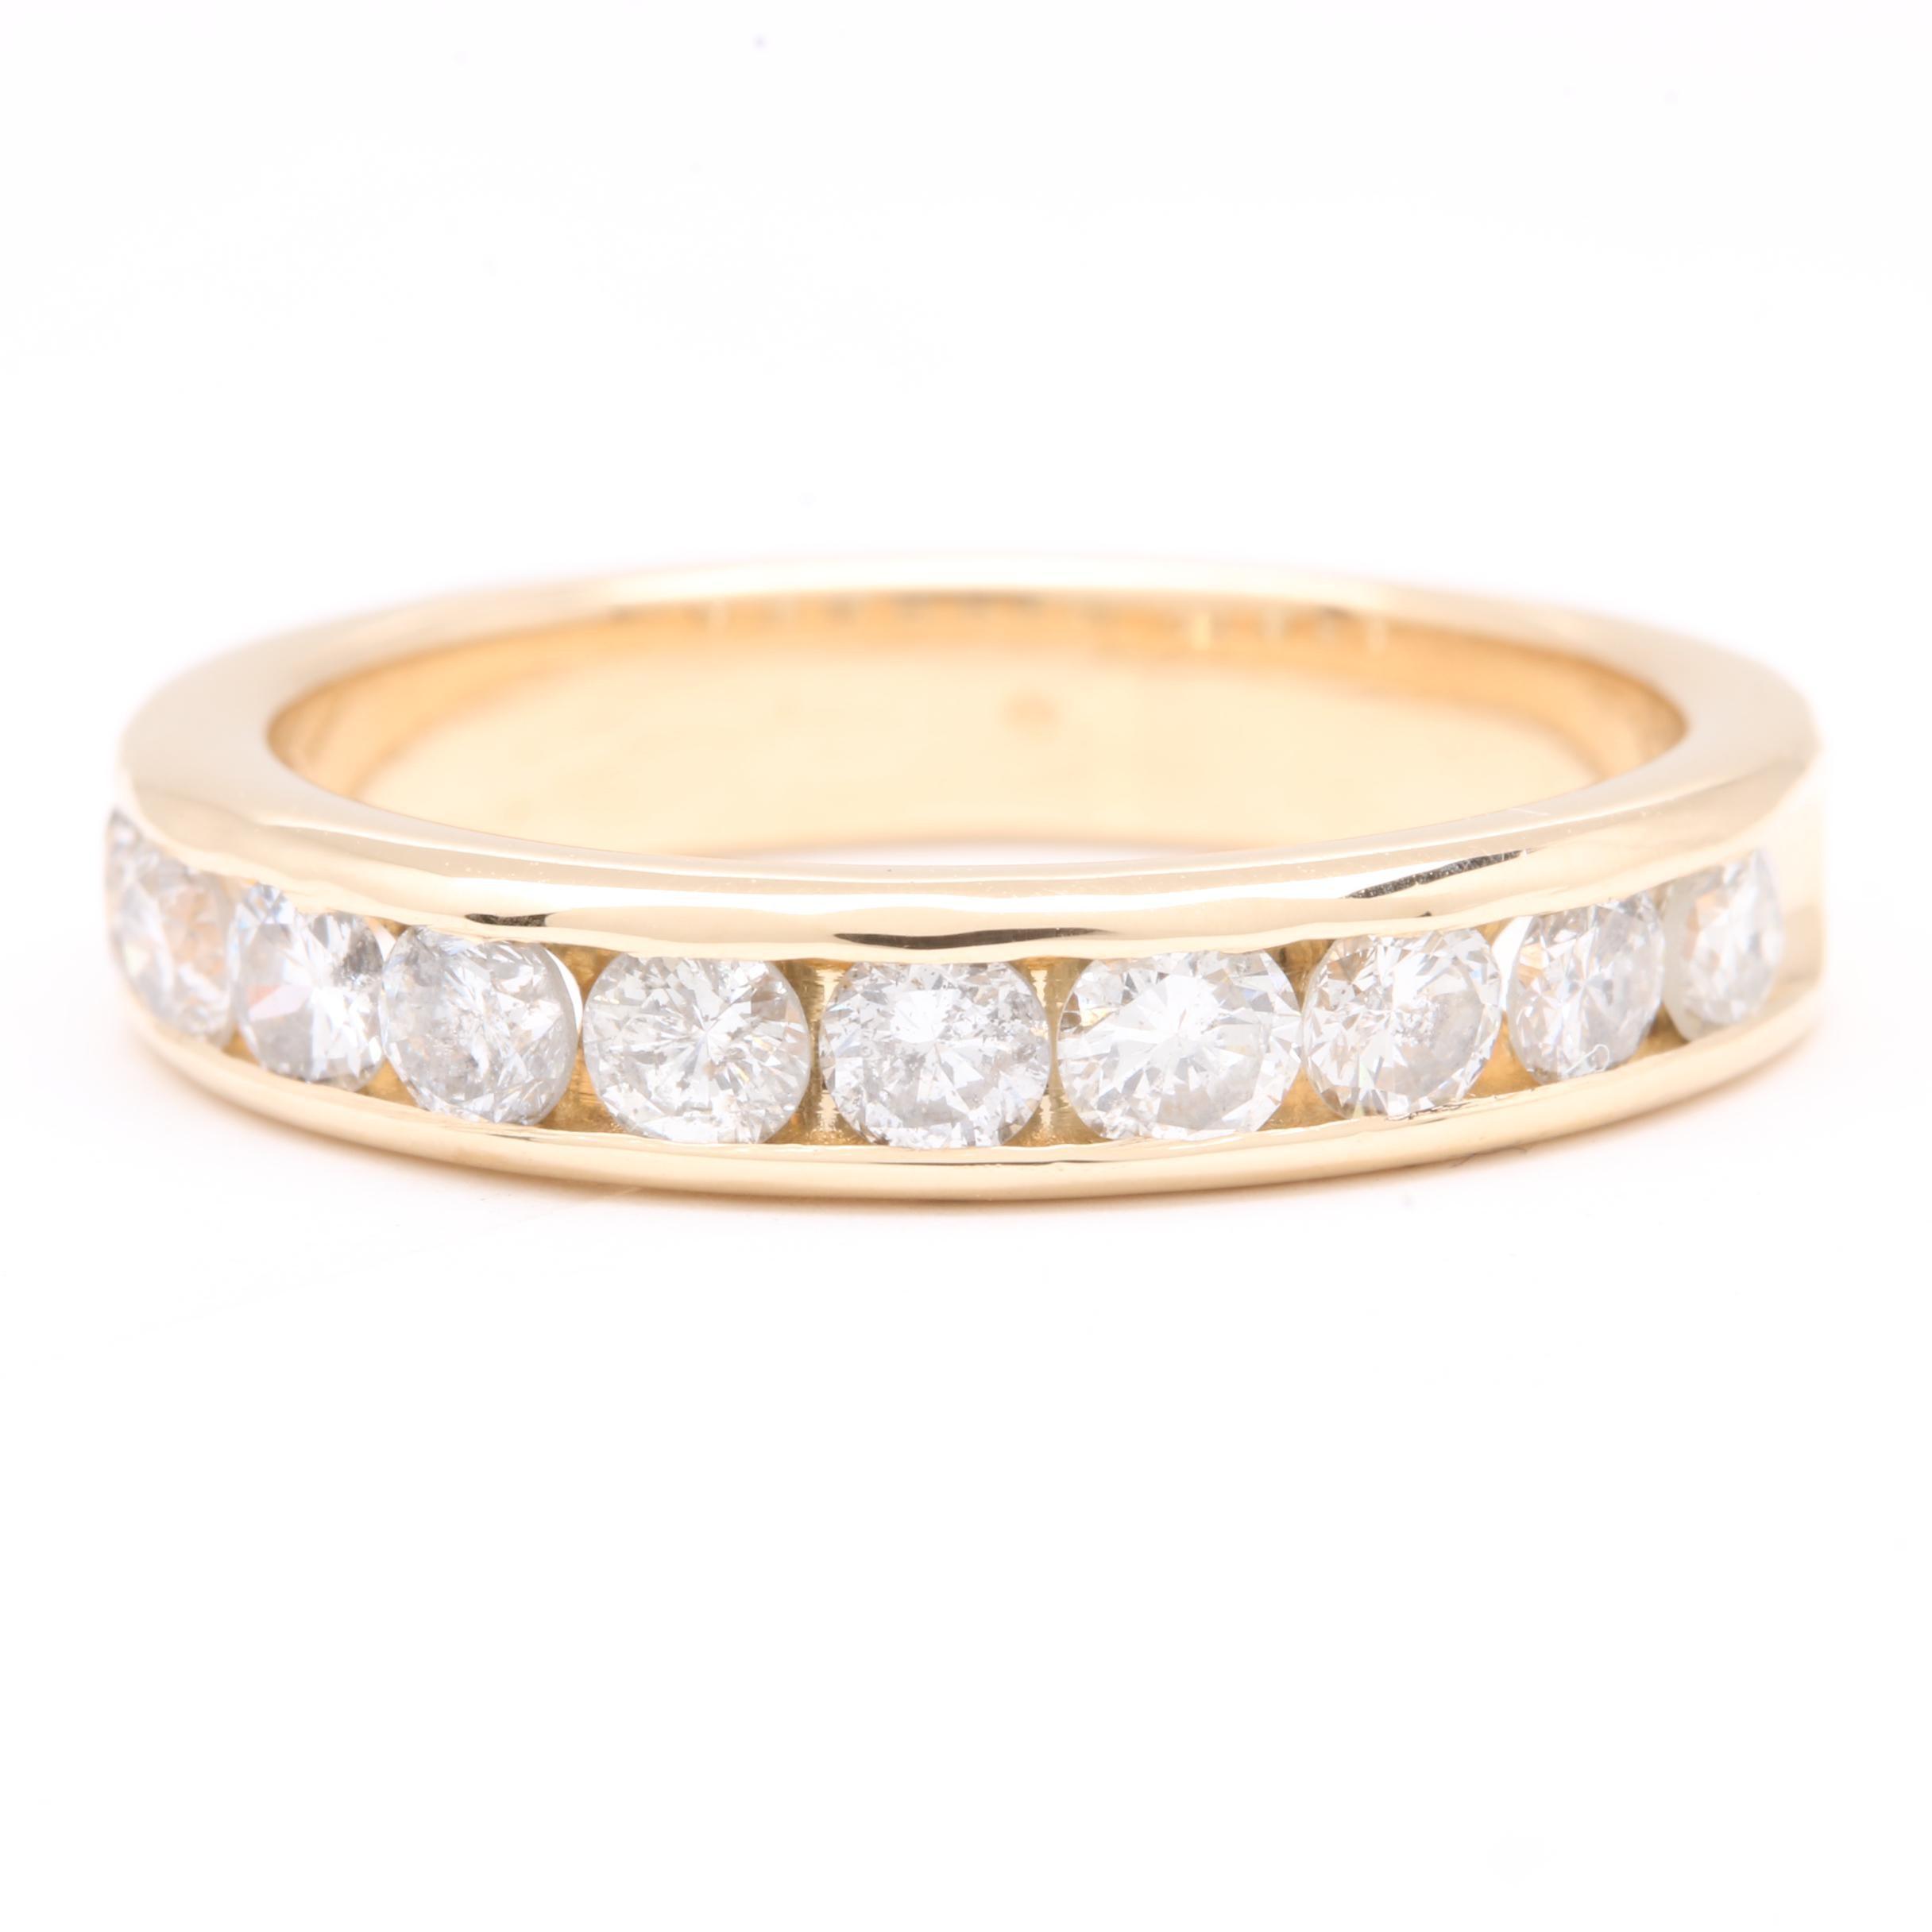 14K Yellow Gold Diamond Channel Ring Band